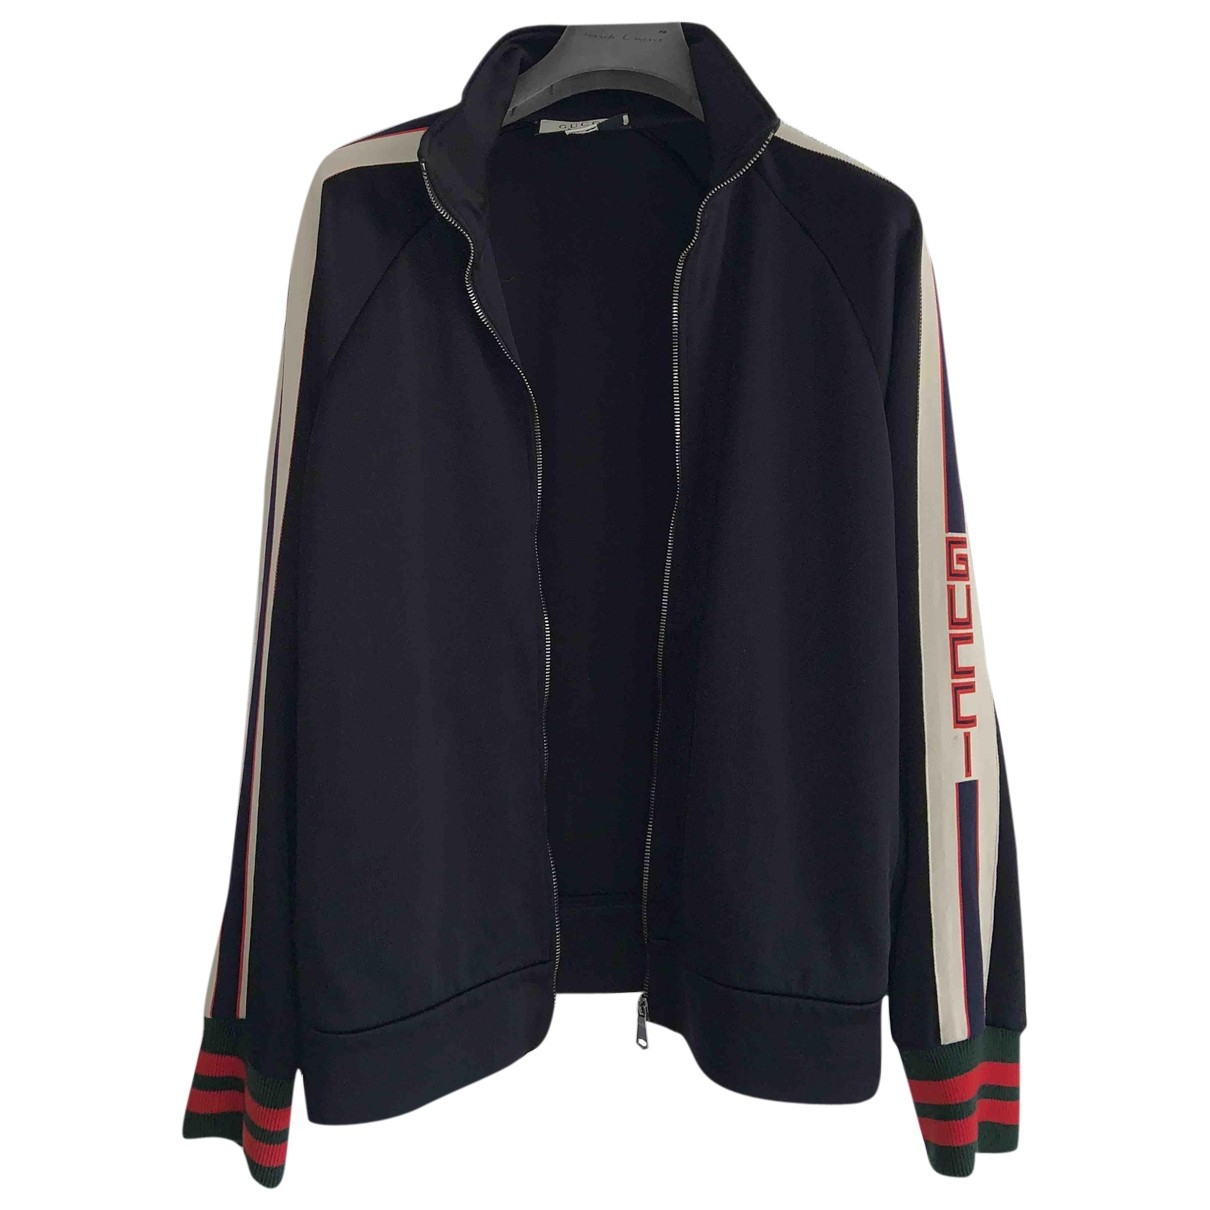 Gucci \N Black Wool jacket  for Men S International